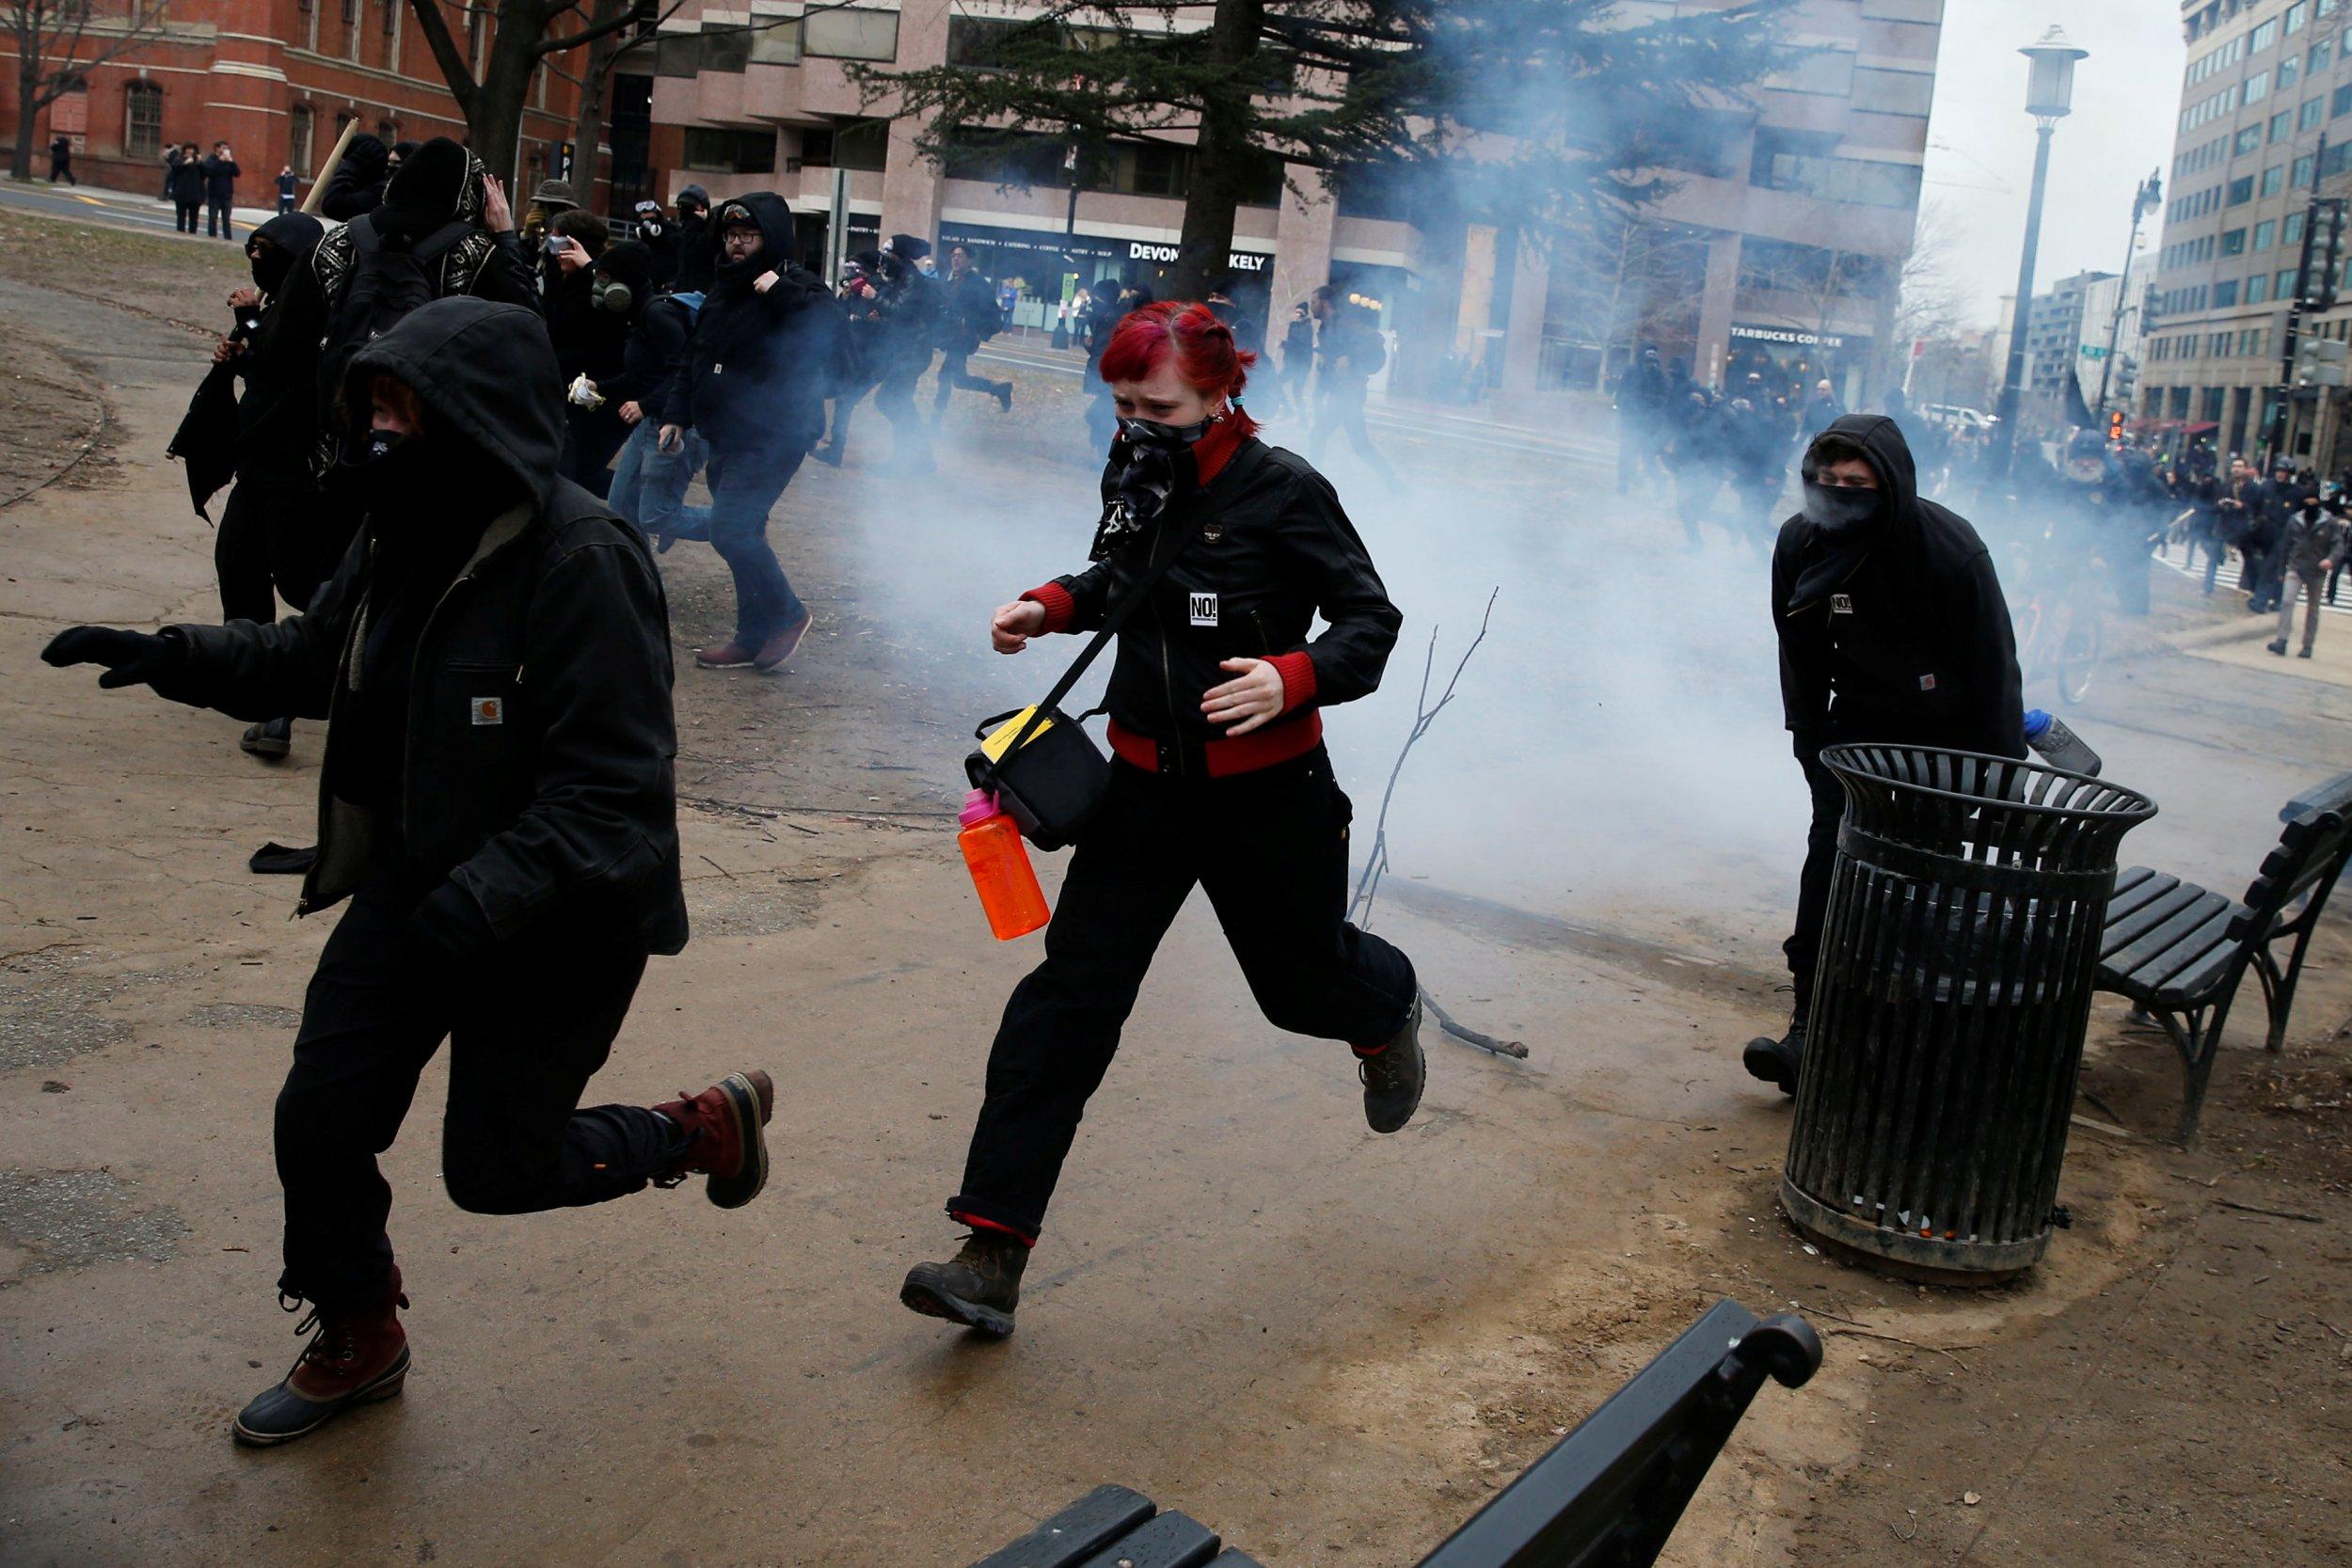 0120_trump_inauguration, demonstrators_01